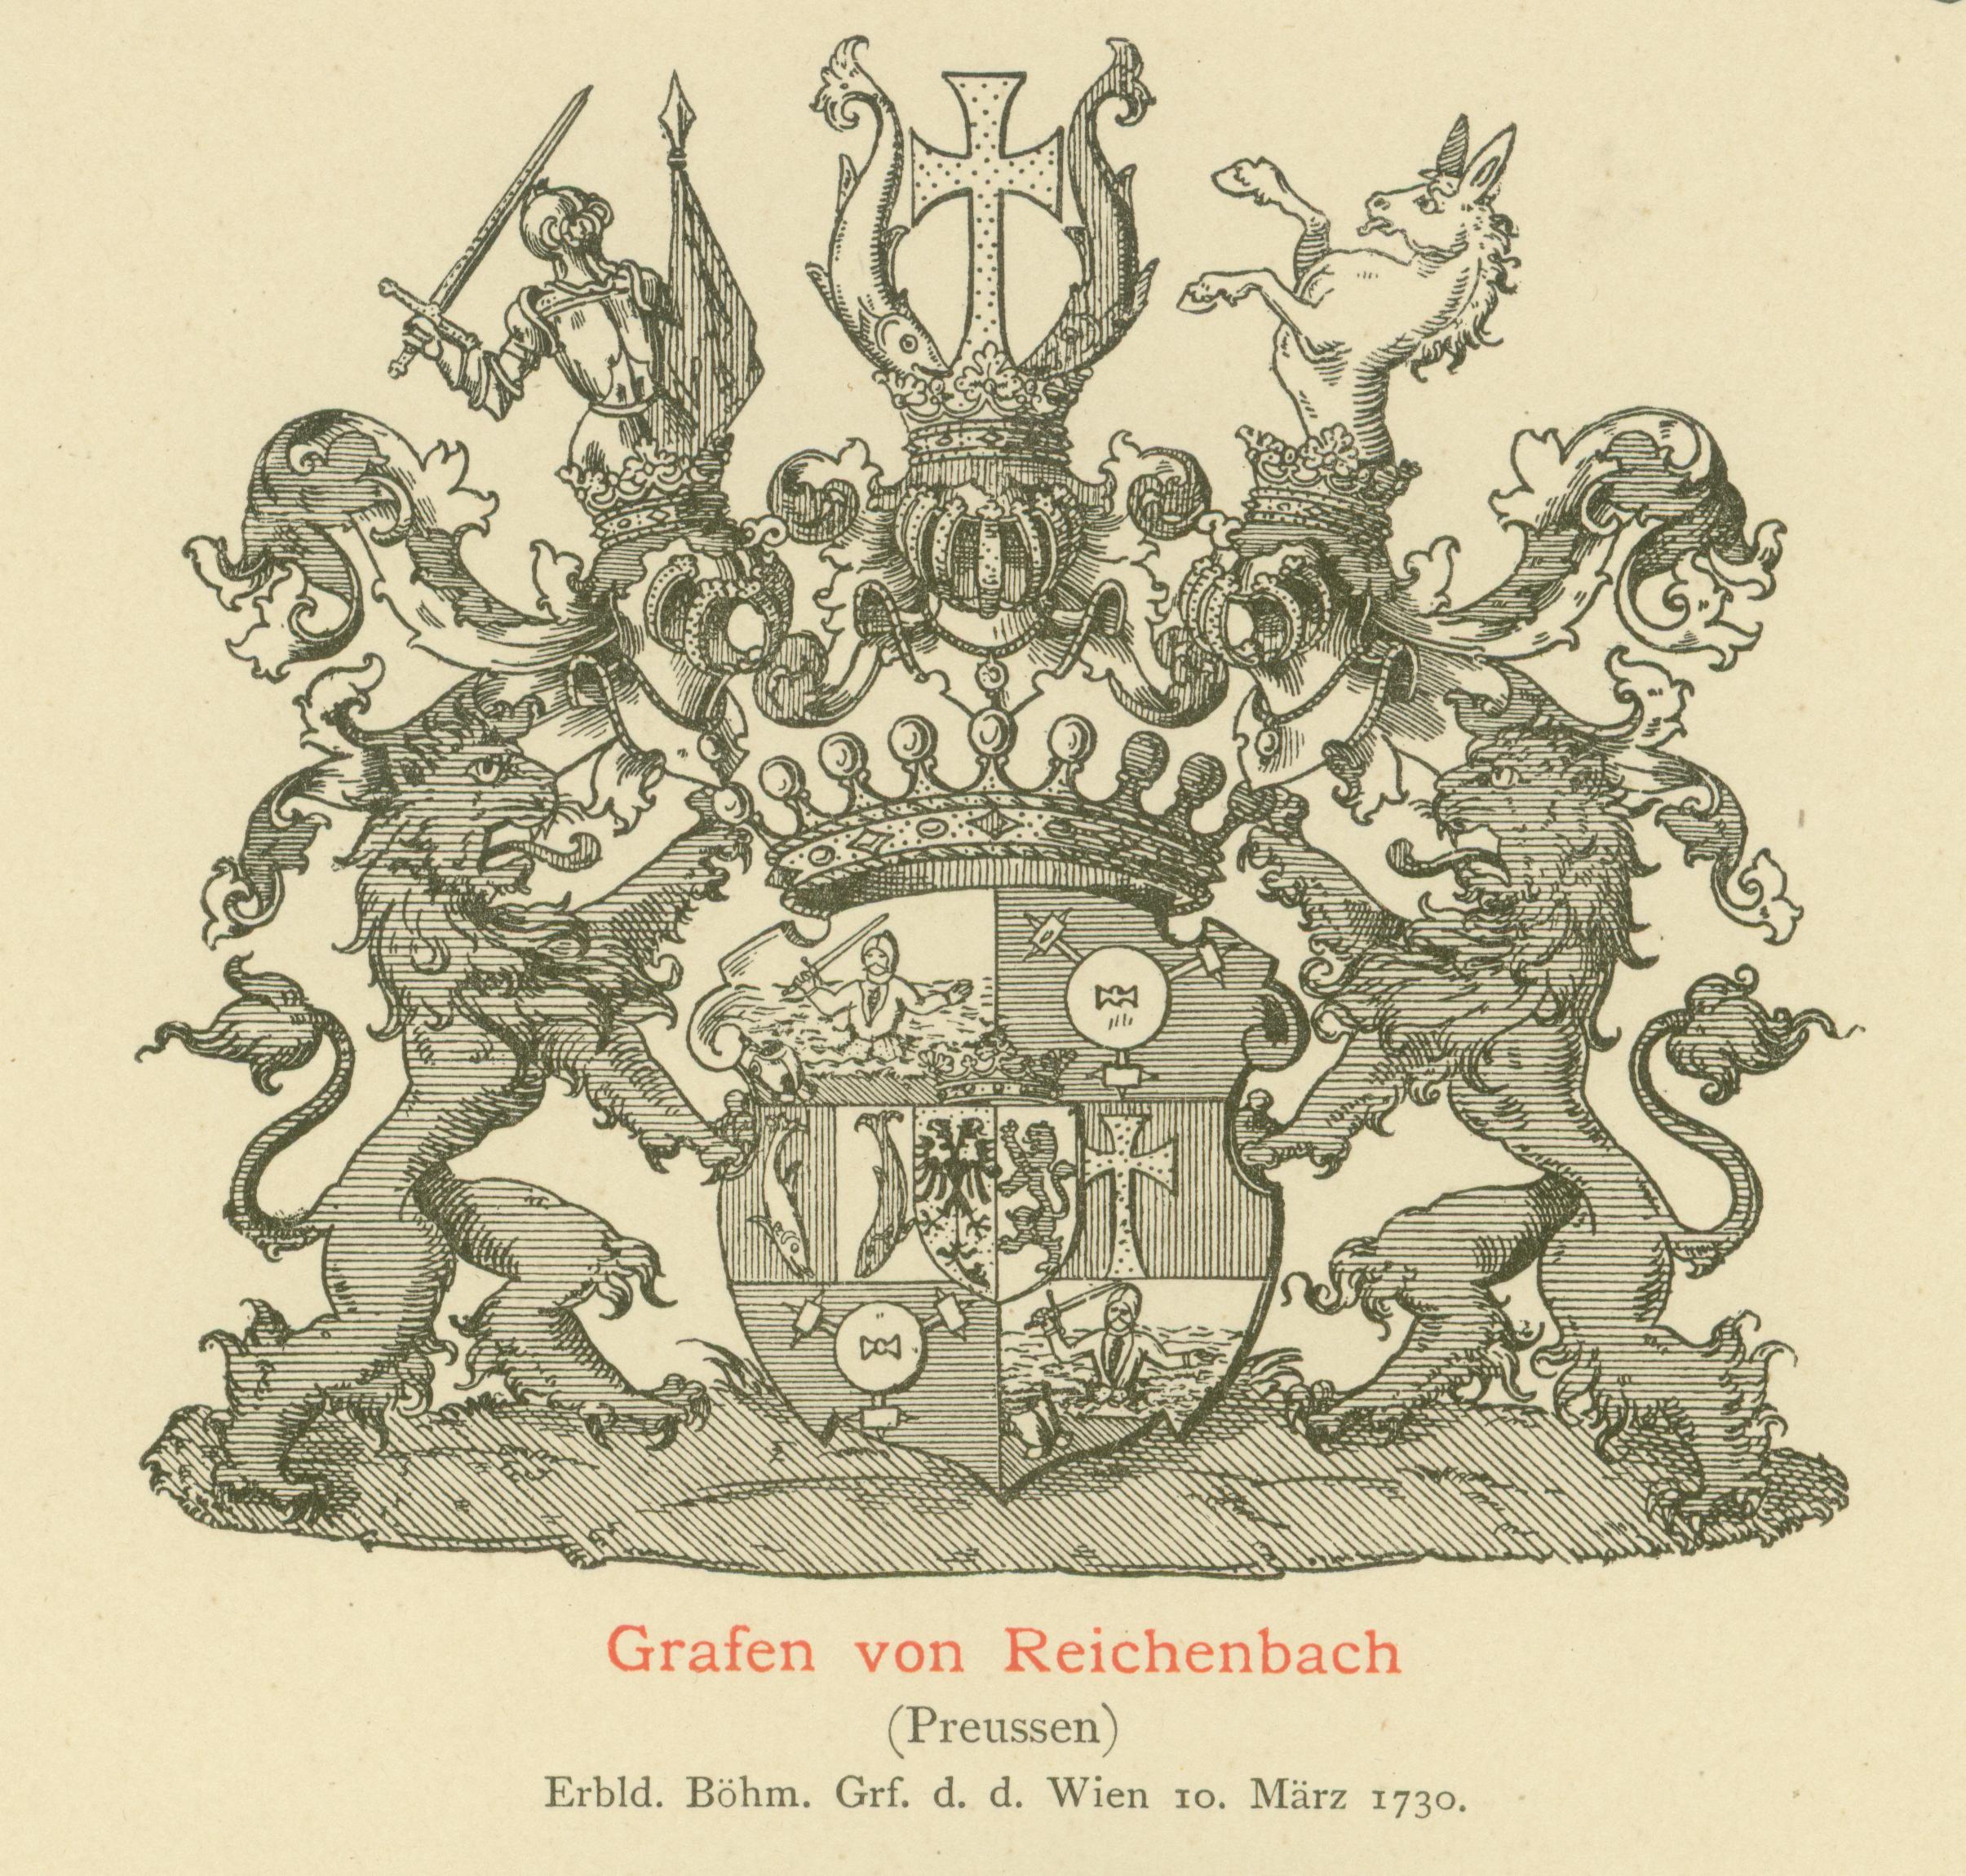 Reichenbach hrabia